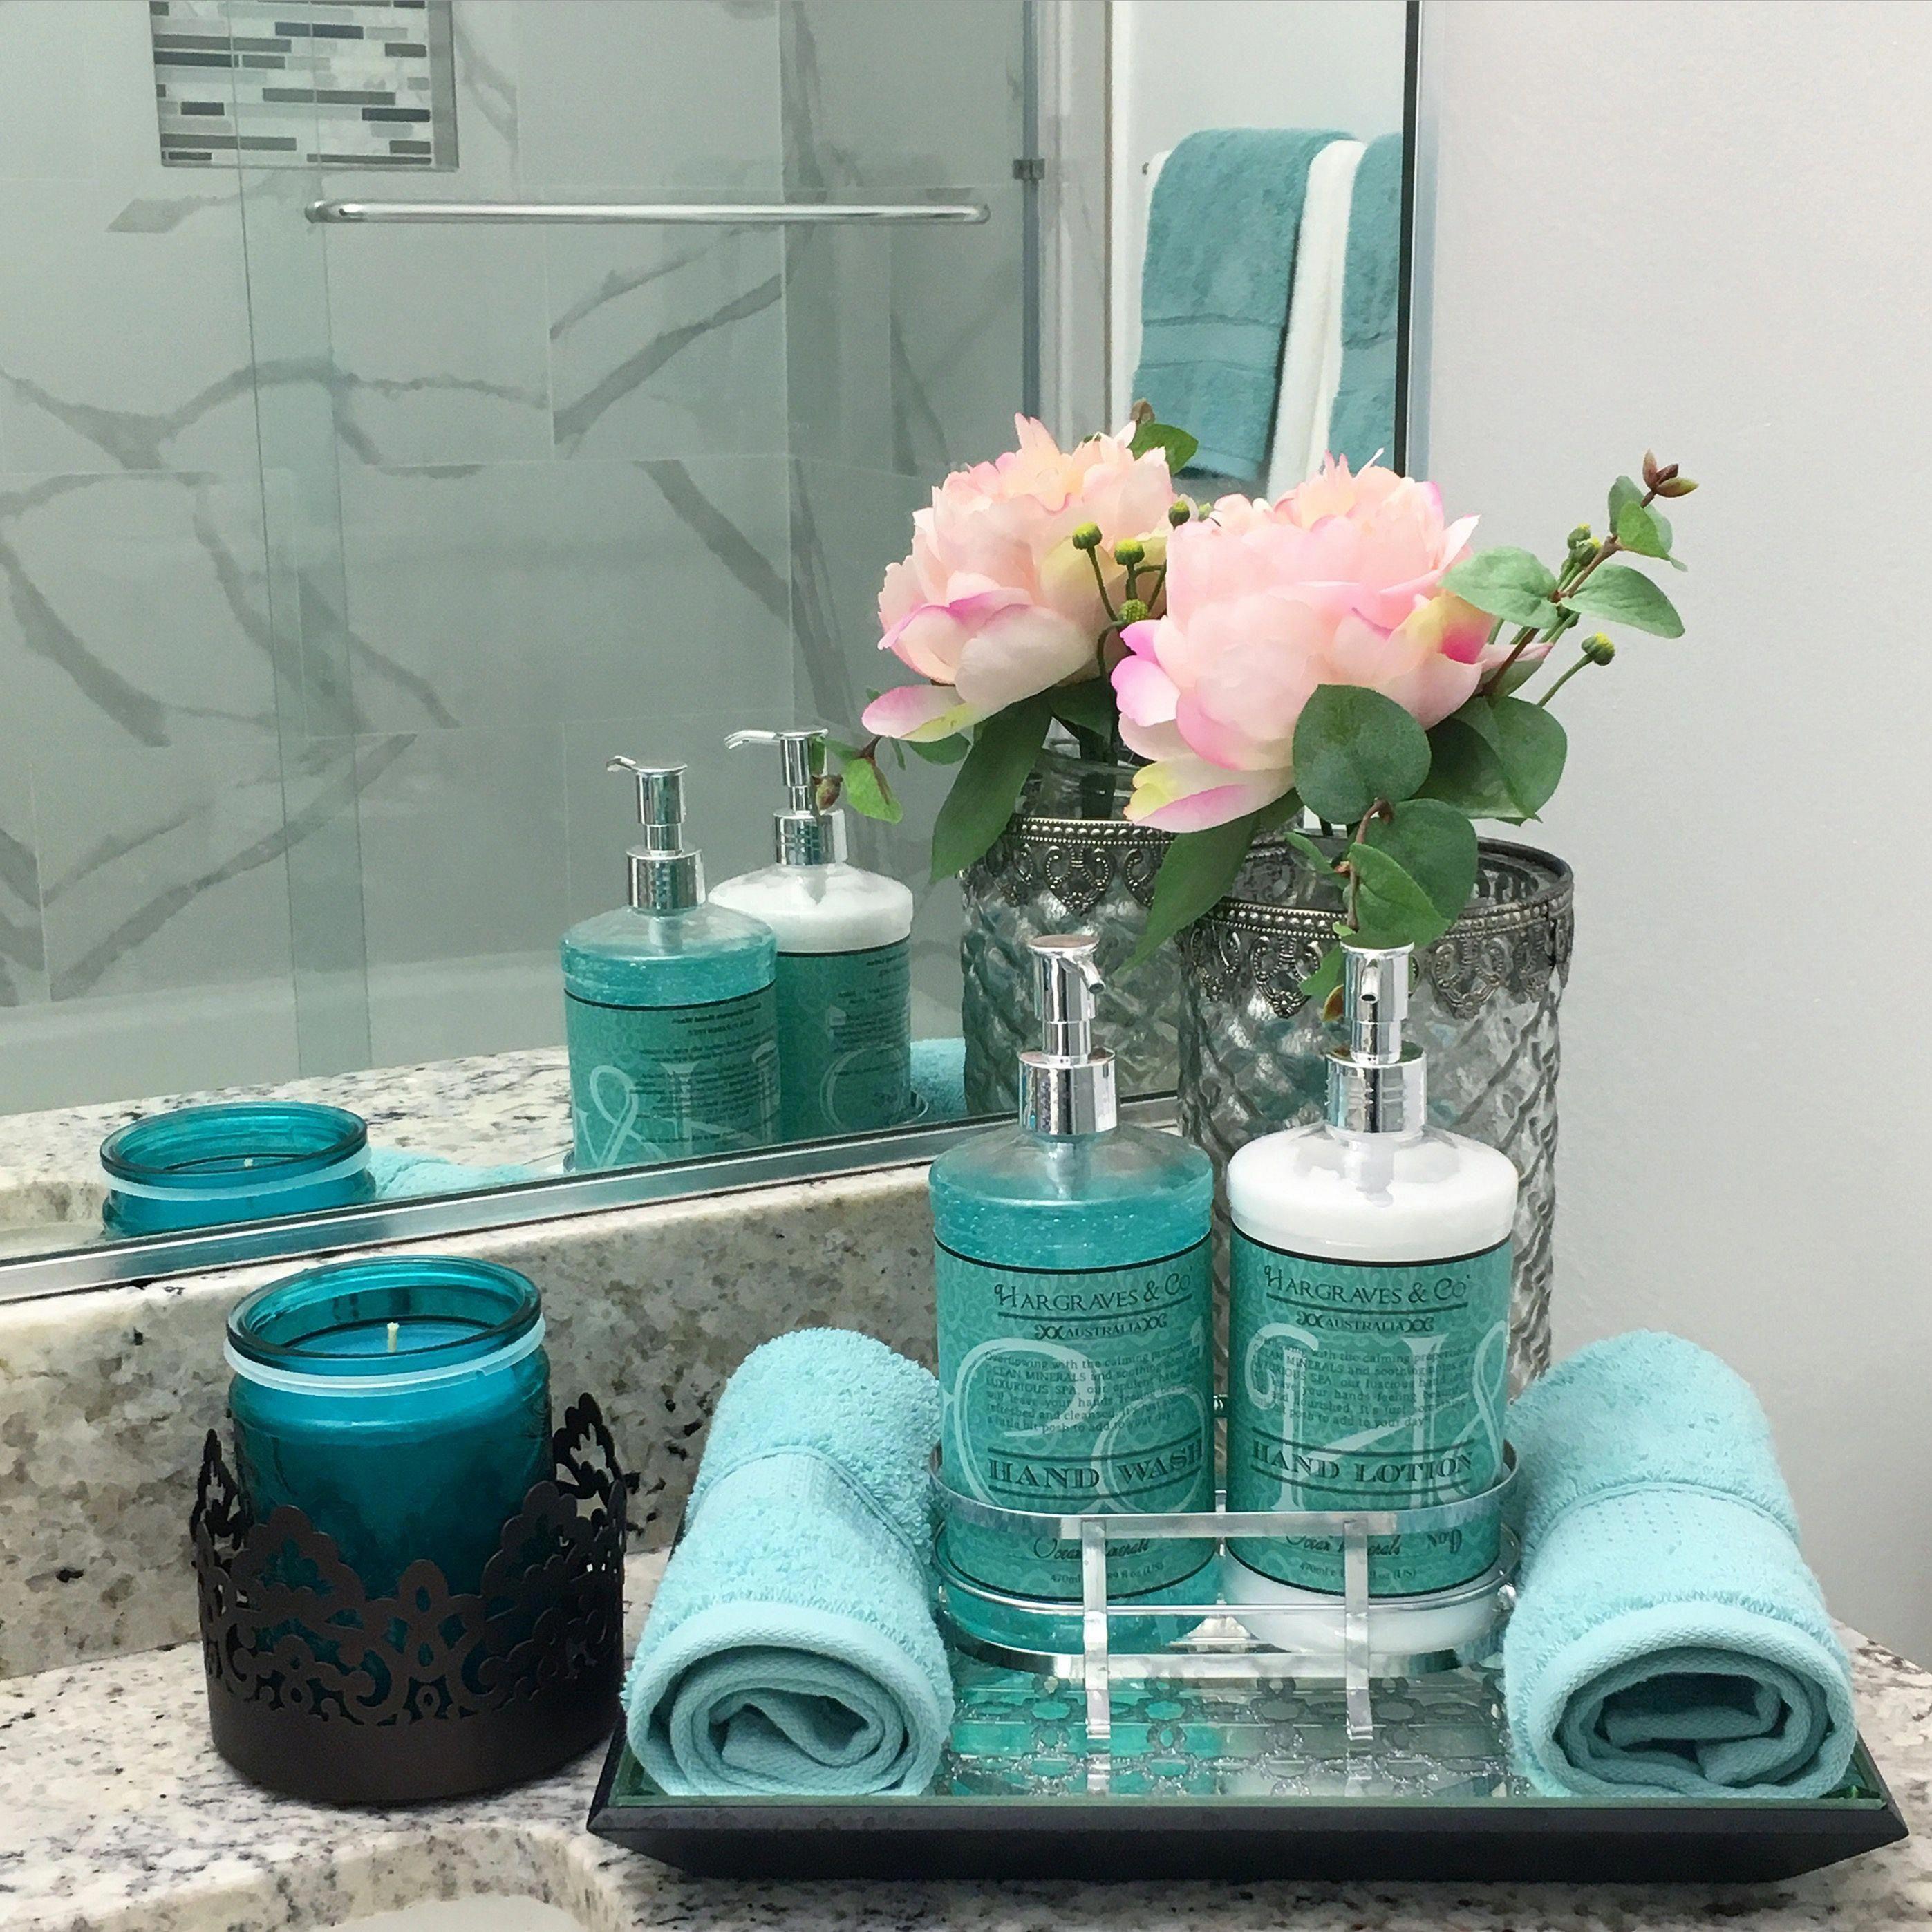 Brown And Teal Bathroom Accessories Tealbathroomtowelset Mermaid Bathroom Decor Teal Bathroom Decor Bathroom Decor Apartment